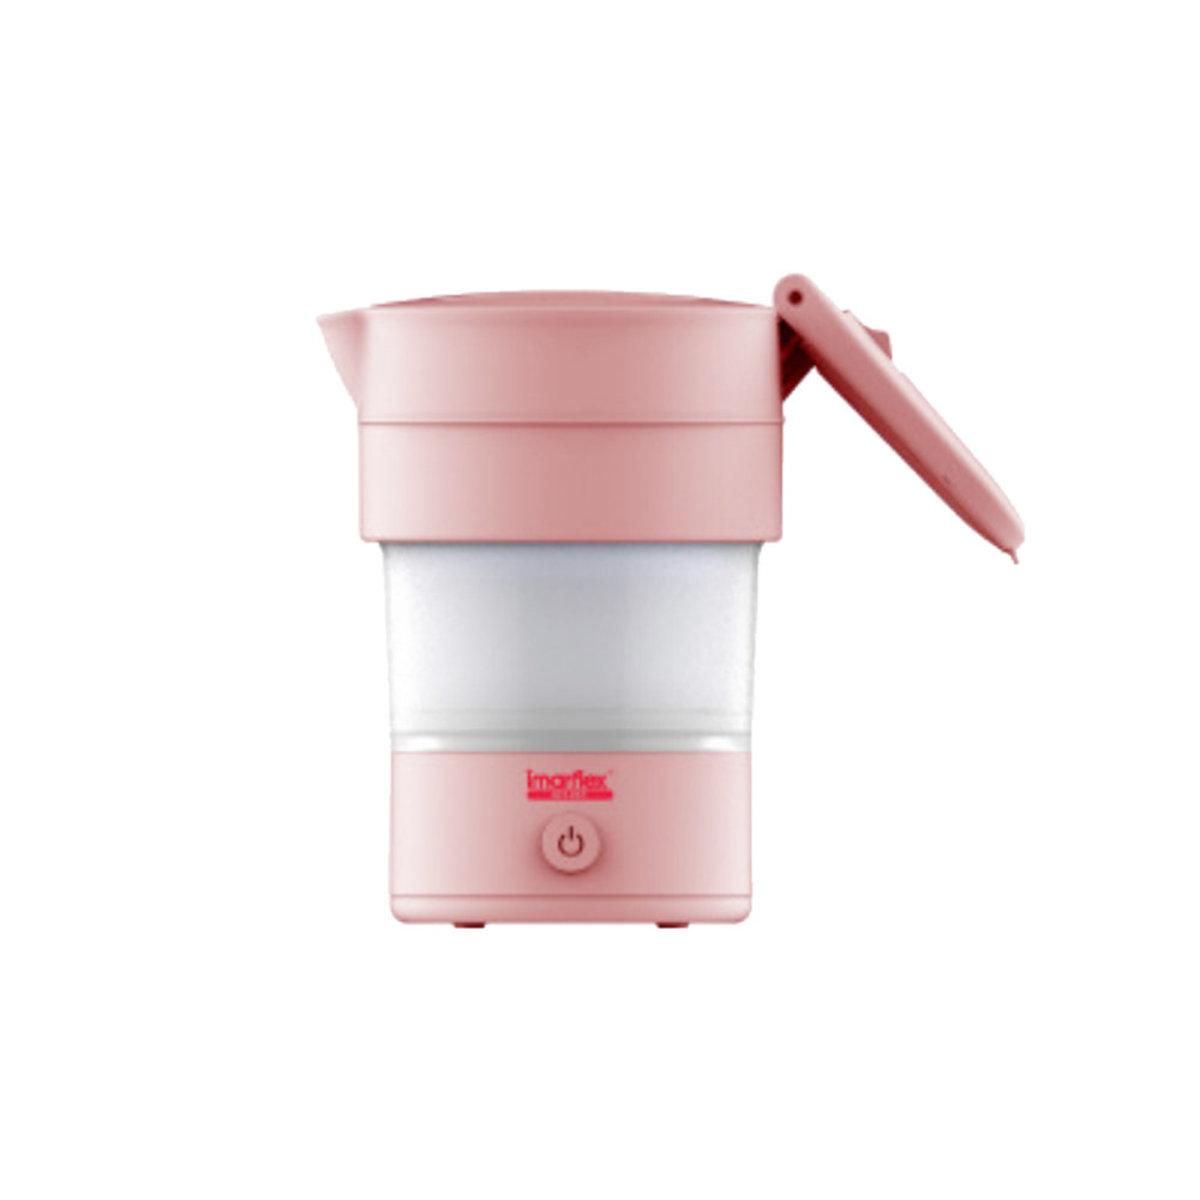 Foldable Travel Kettle - IKT-06T (Pink)